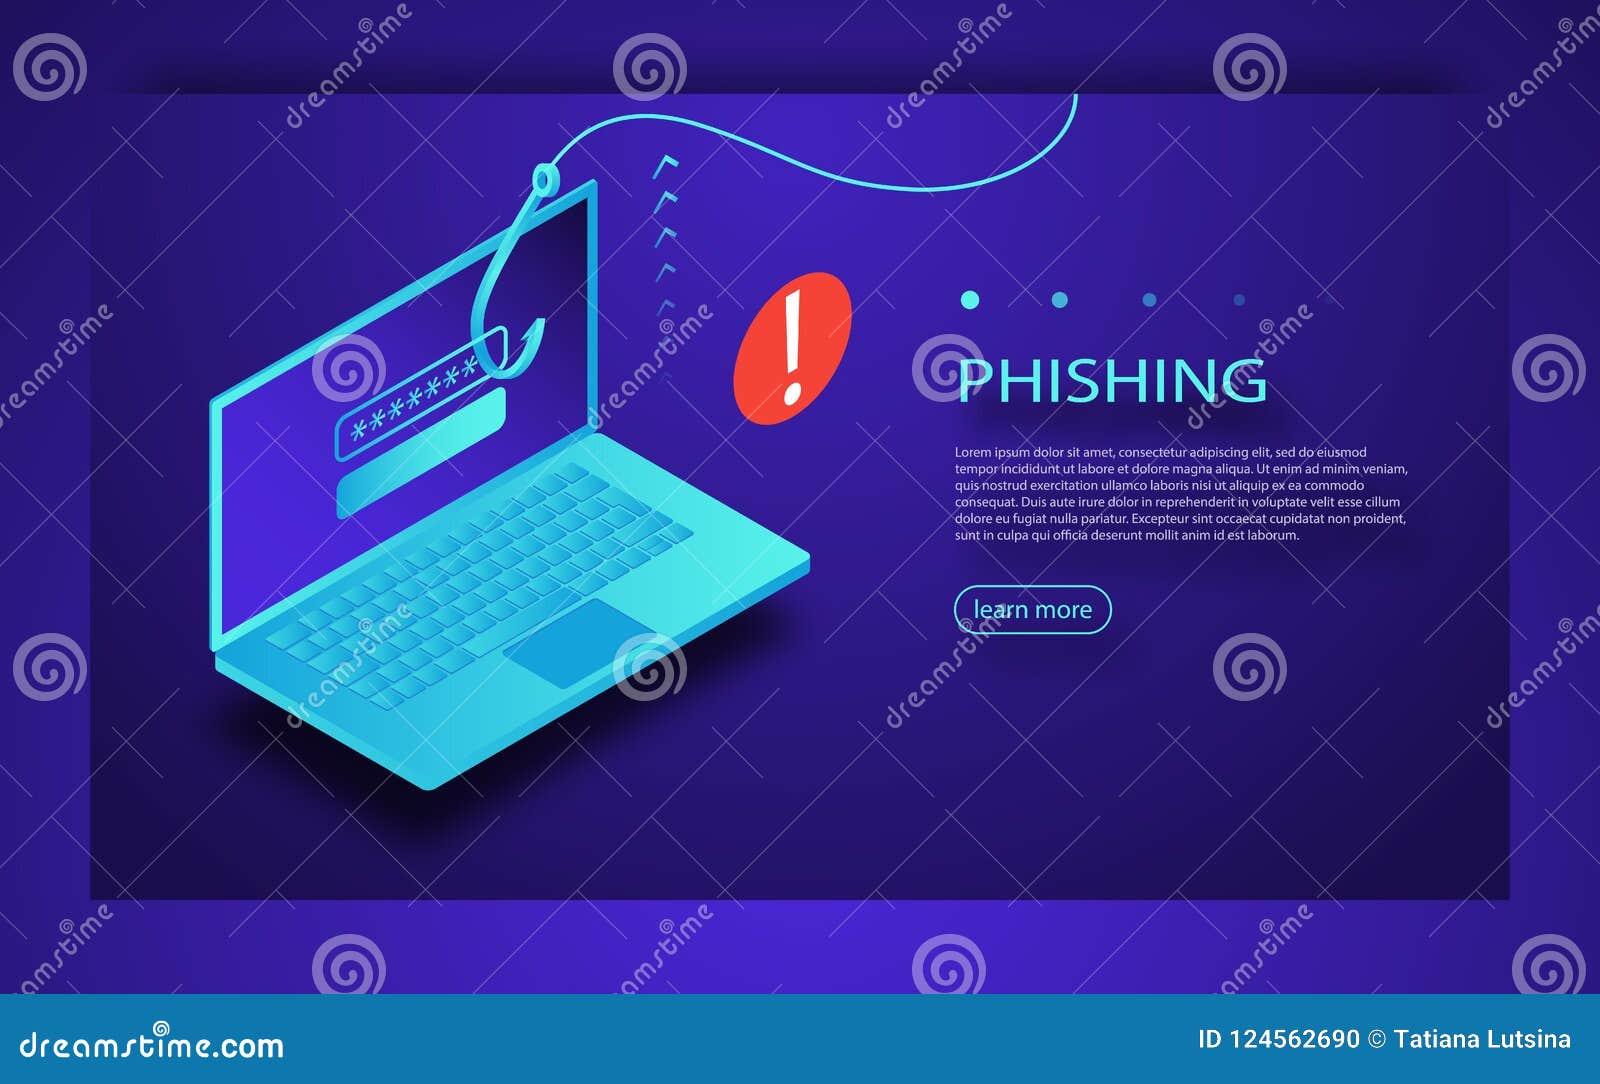 Internet Phishing, Hacked Login And Password  Phishing Scam